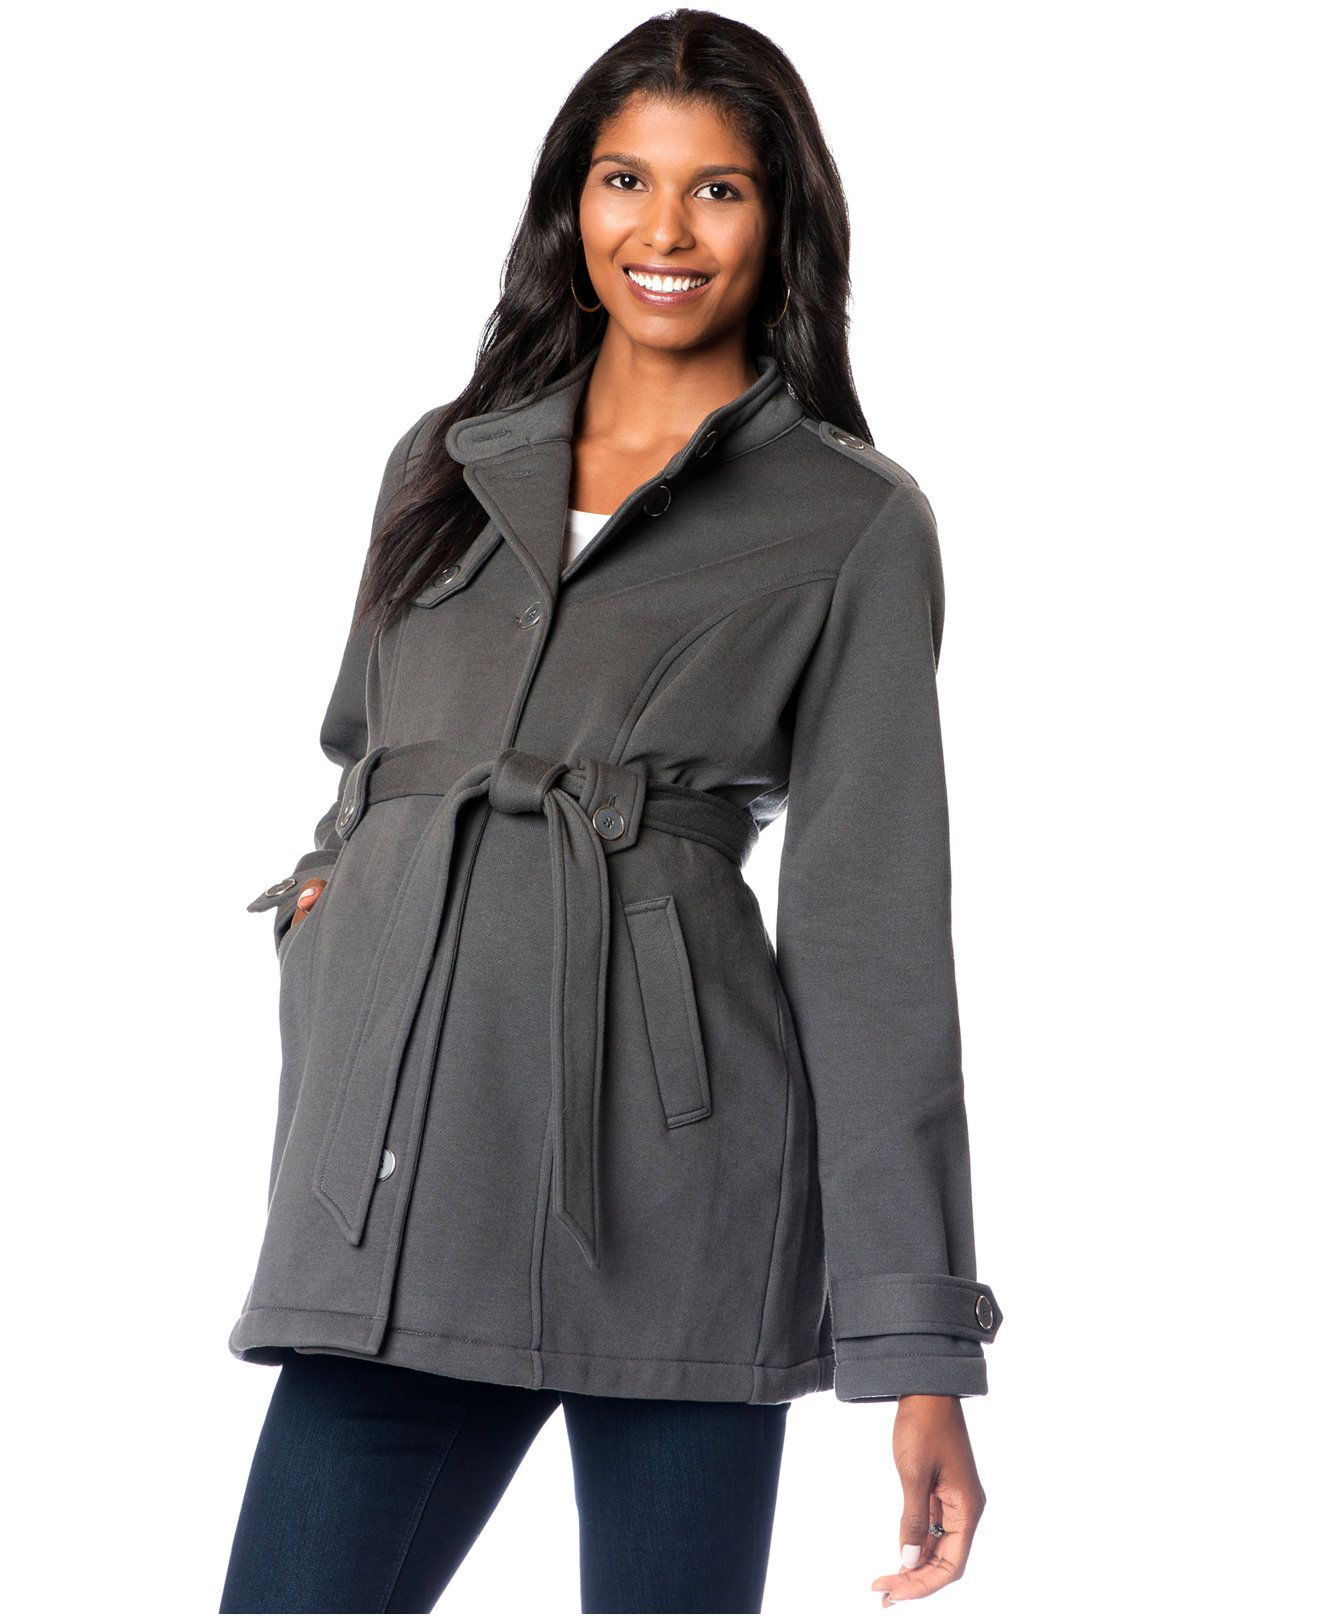 7e0de5e22cad6 Motherhood Maternity Button-Front Belted Jacket - Maternity - Women -  Macy's #maternity #coats #jackets #winter #bargains